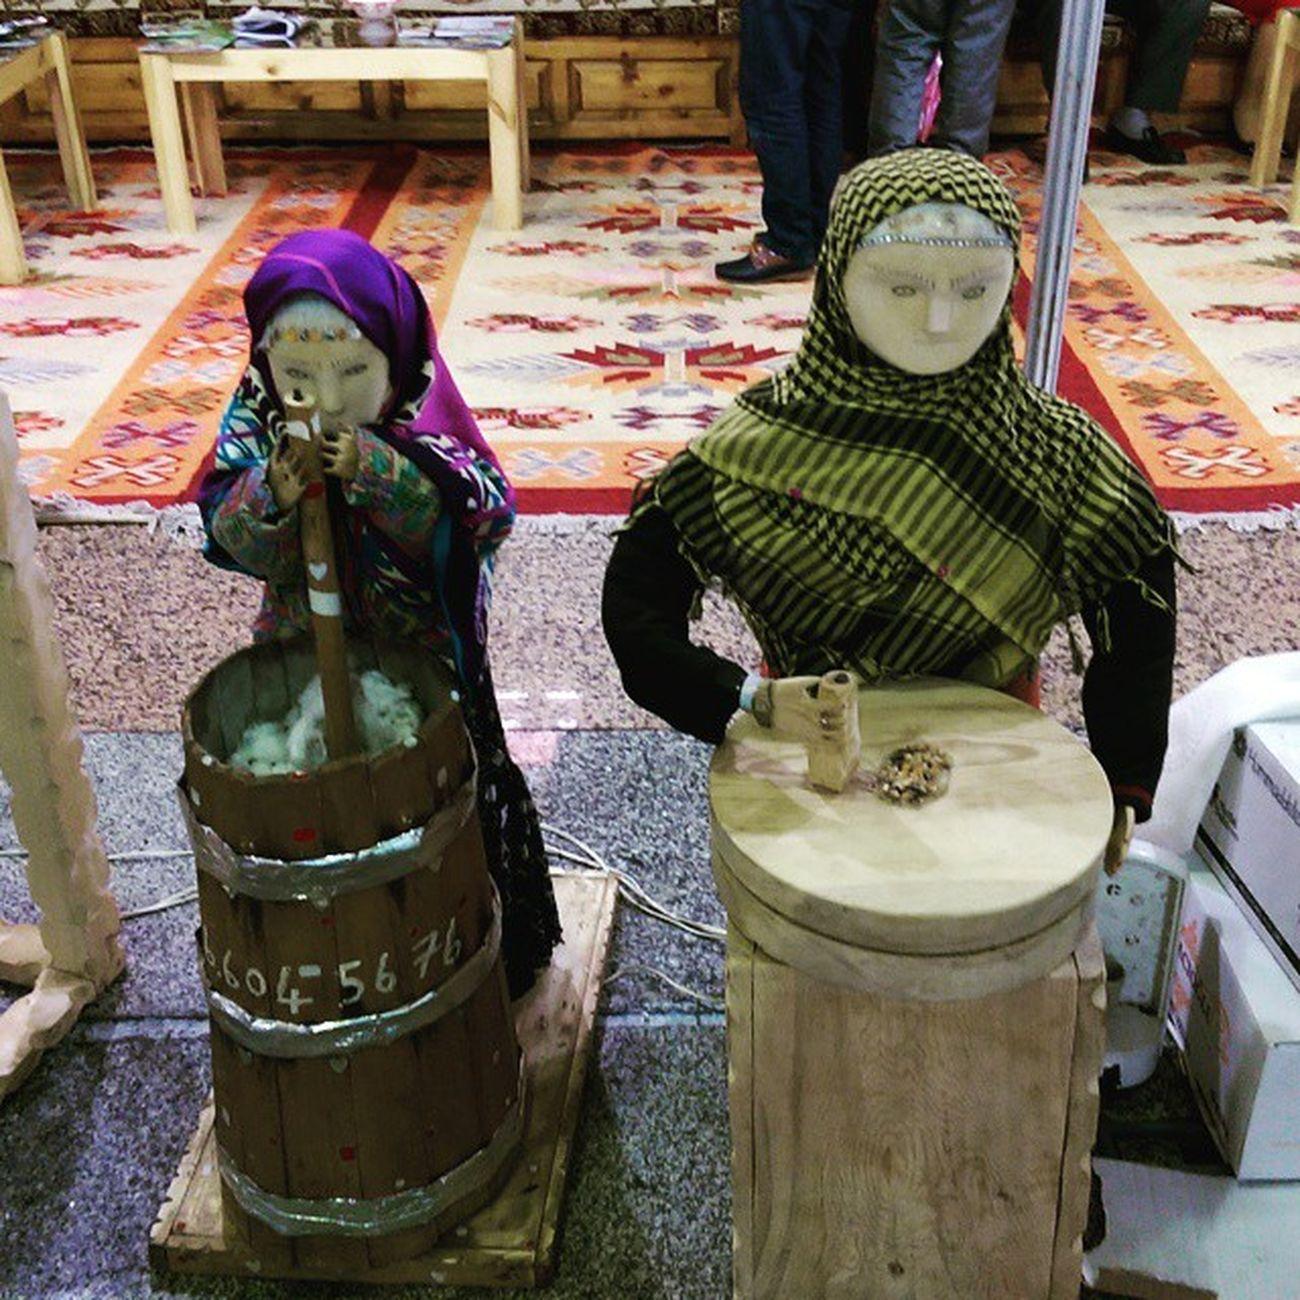 Feshane Kastamonu Günleri Feshane Kastamonu Eyüpsultan  Istanbul kermes senlik yoresel travel color